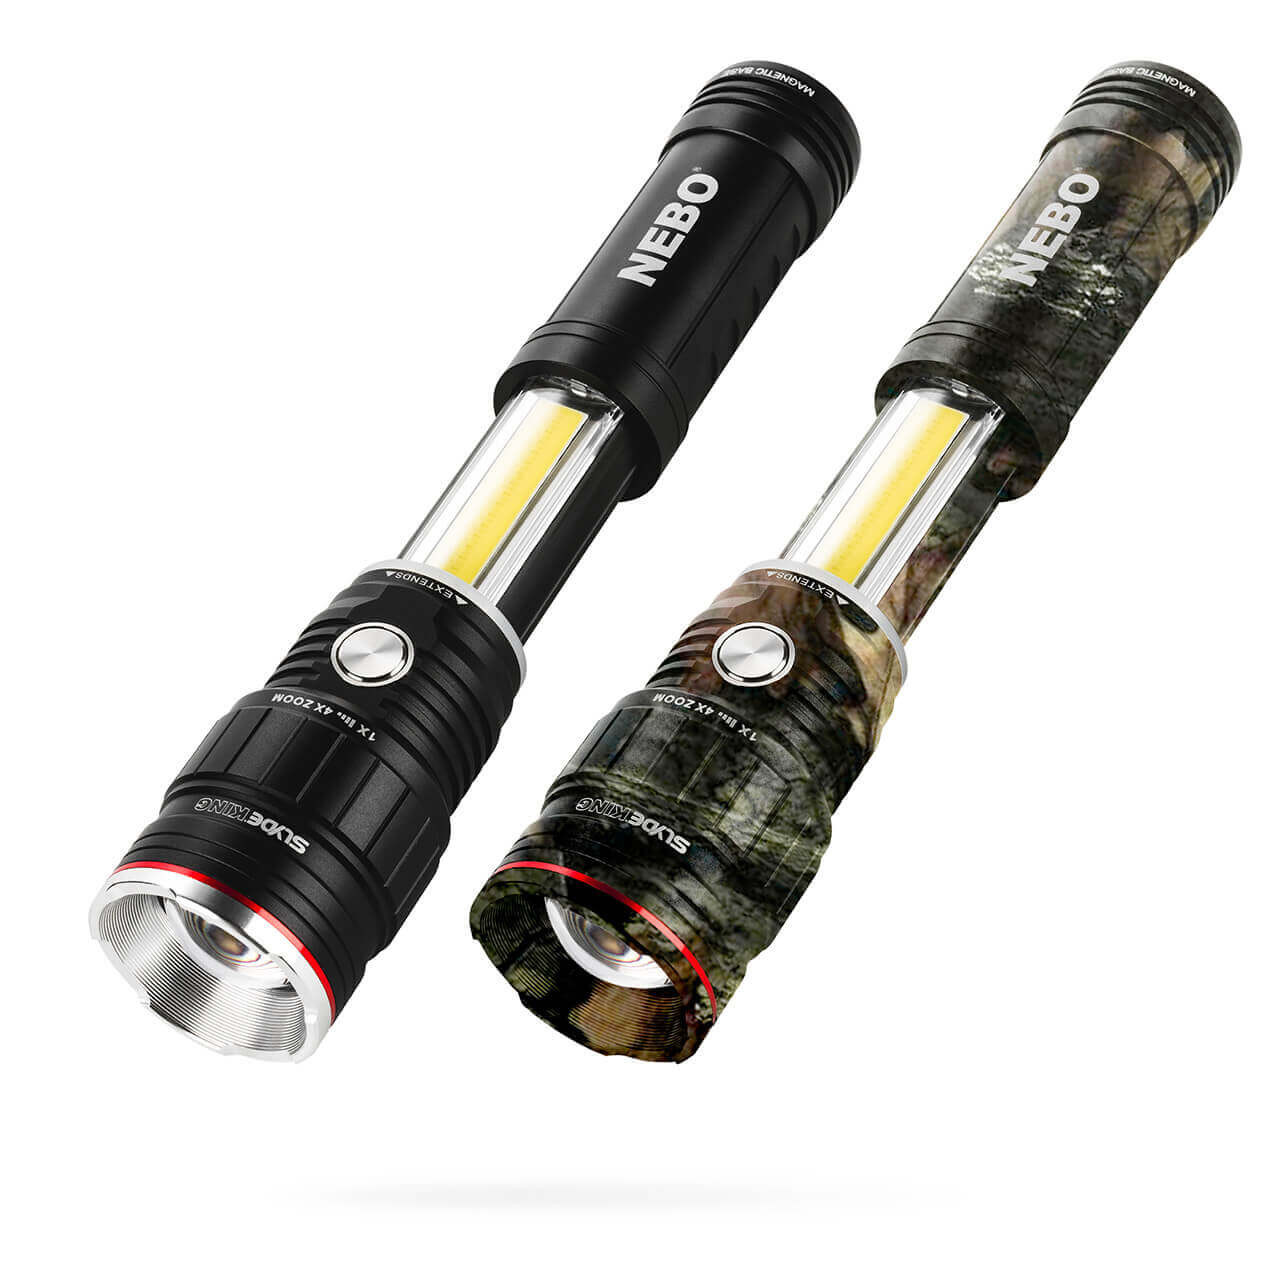 Nebo® Slyde® King Rechargeable Flashlight